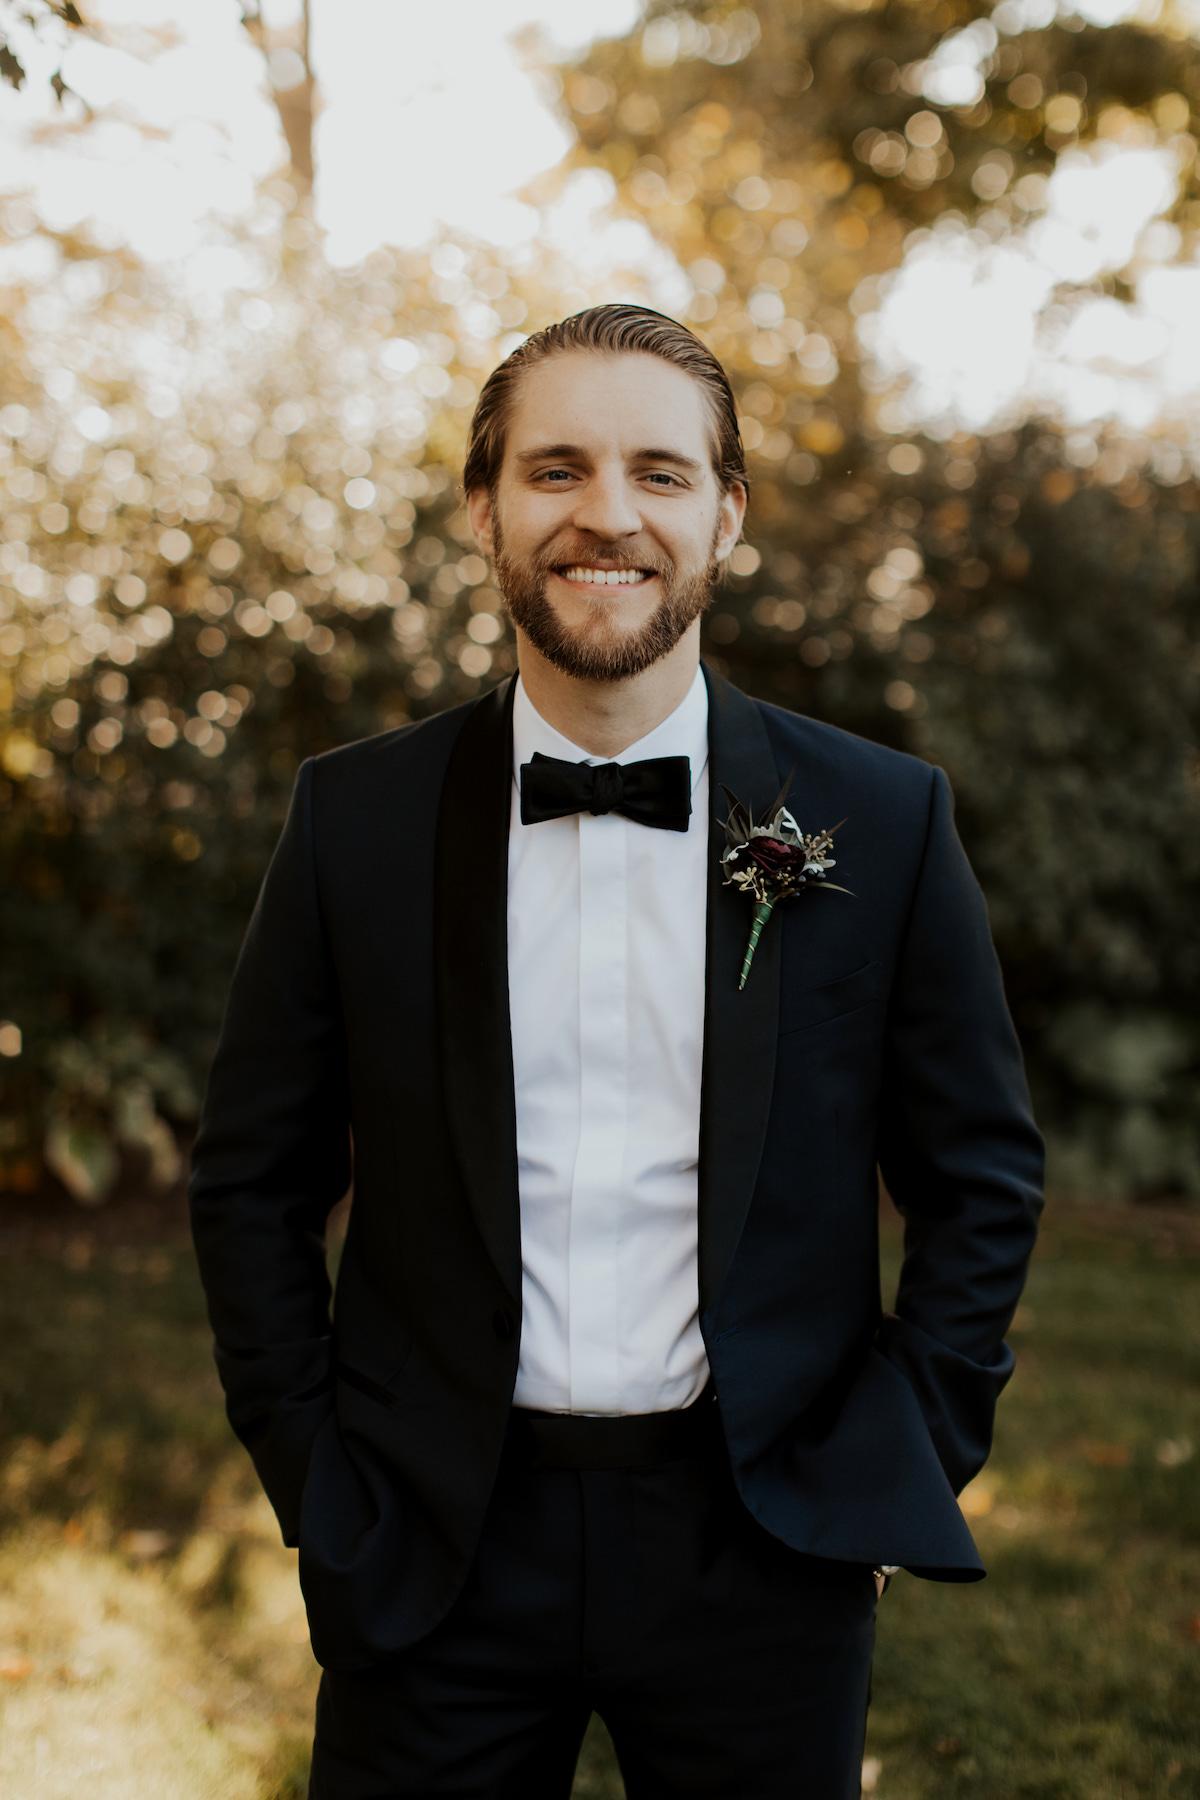 Katies Bliss Wedding Groom Portraits